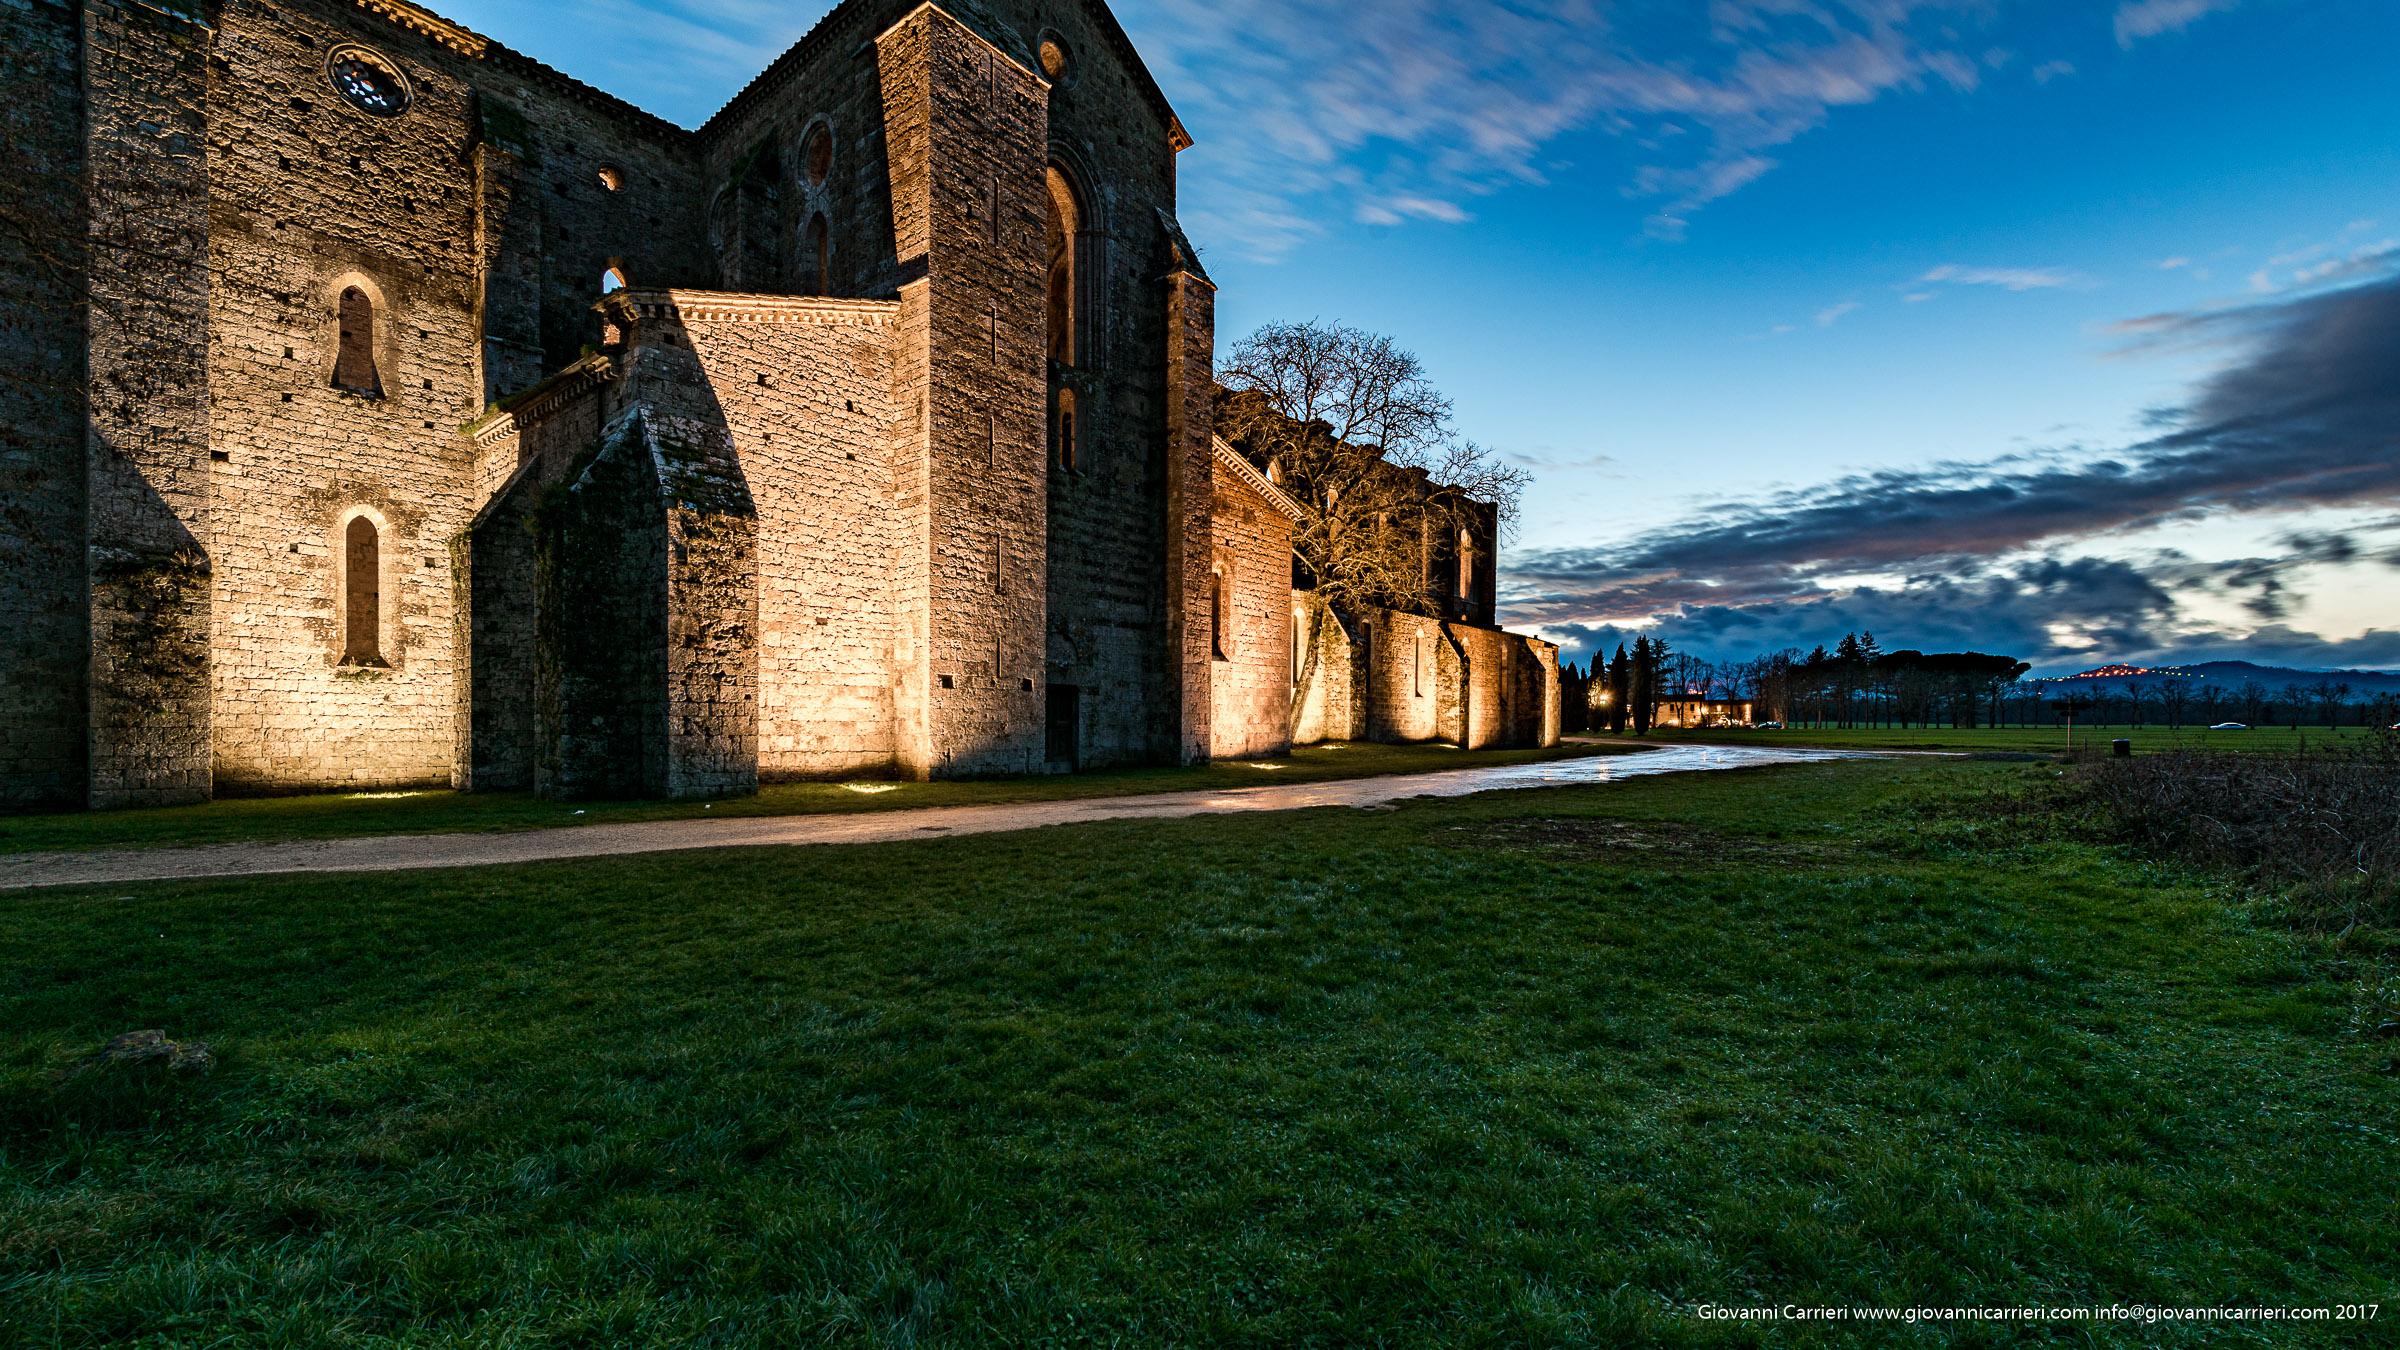 San Galgano Abbey viewed durign sunset